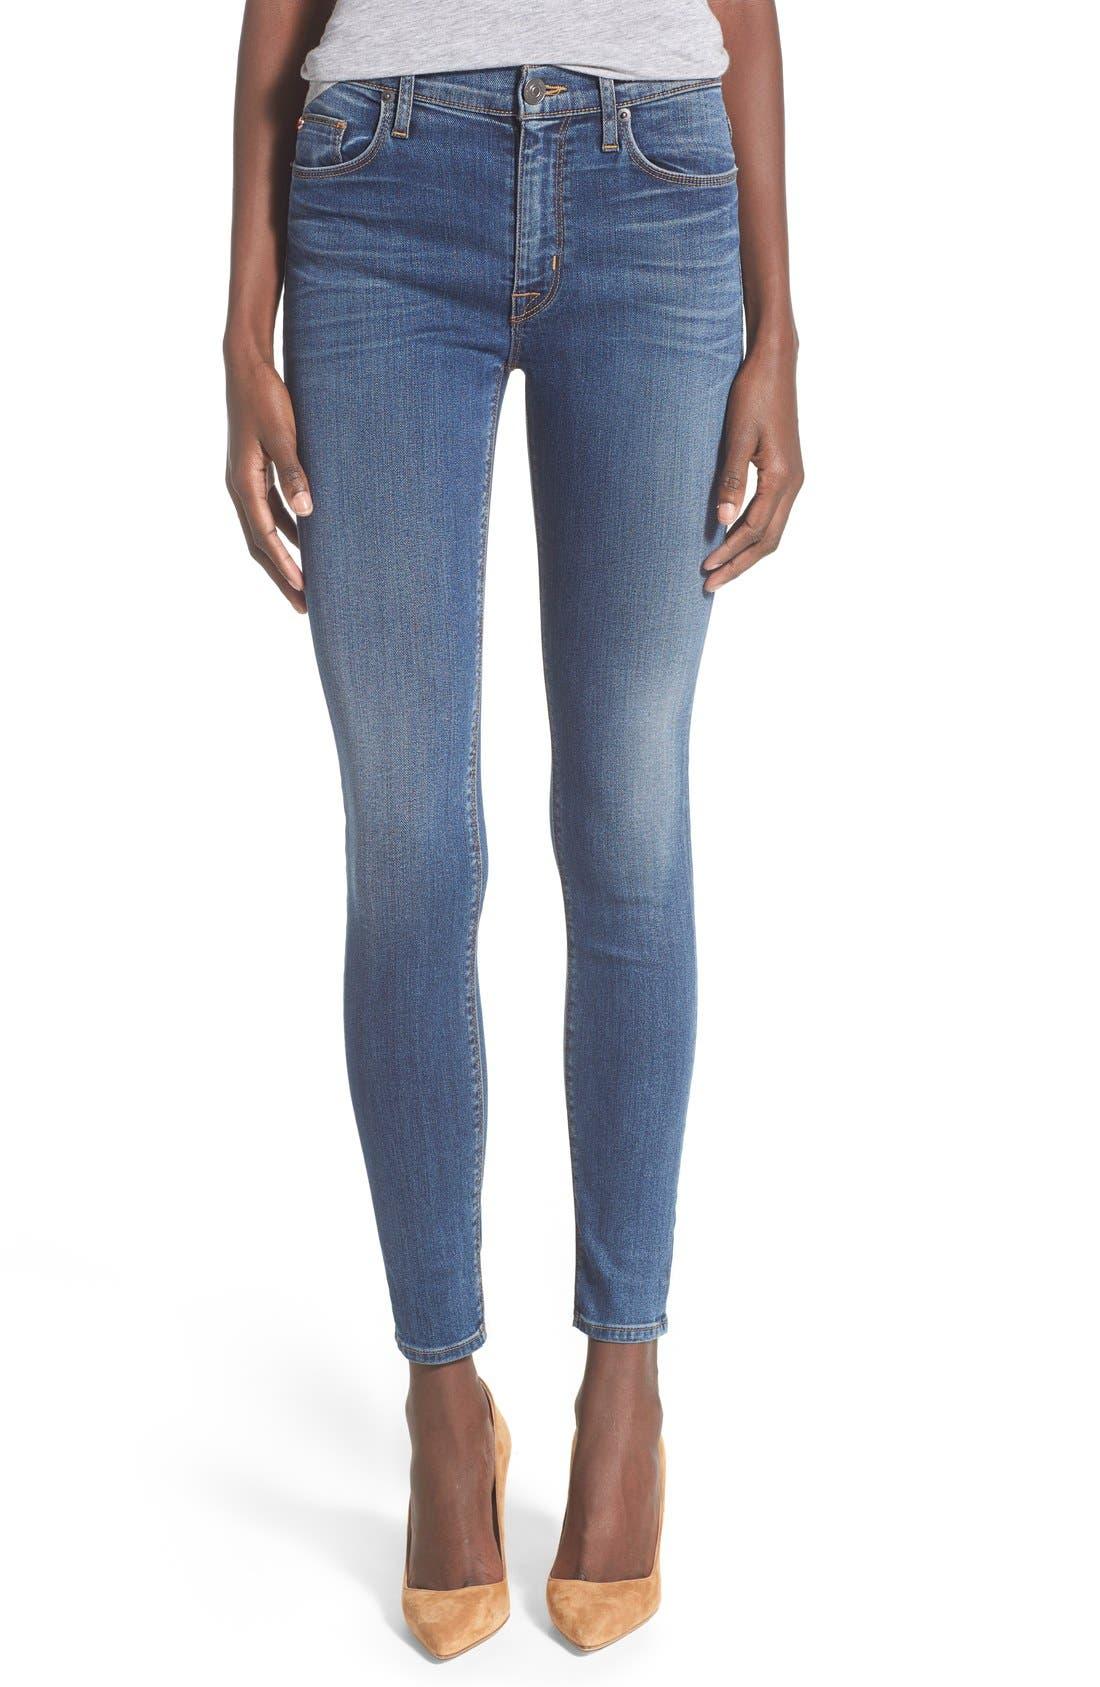 Alternate Image 1 Selected - Hudson Jeans 'Barbara' High Rise Skinny Jeans